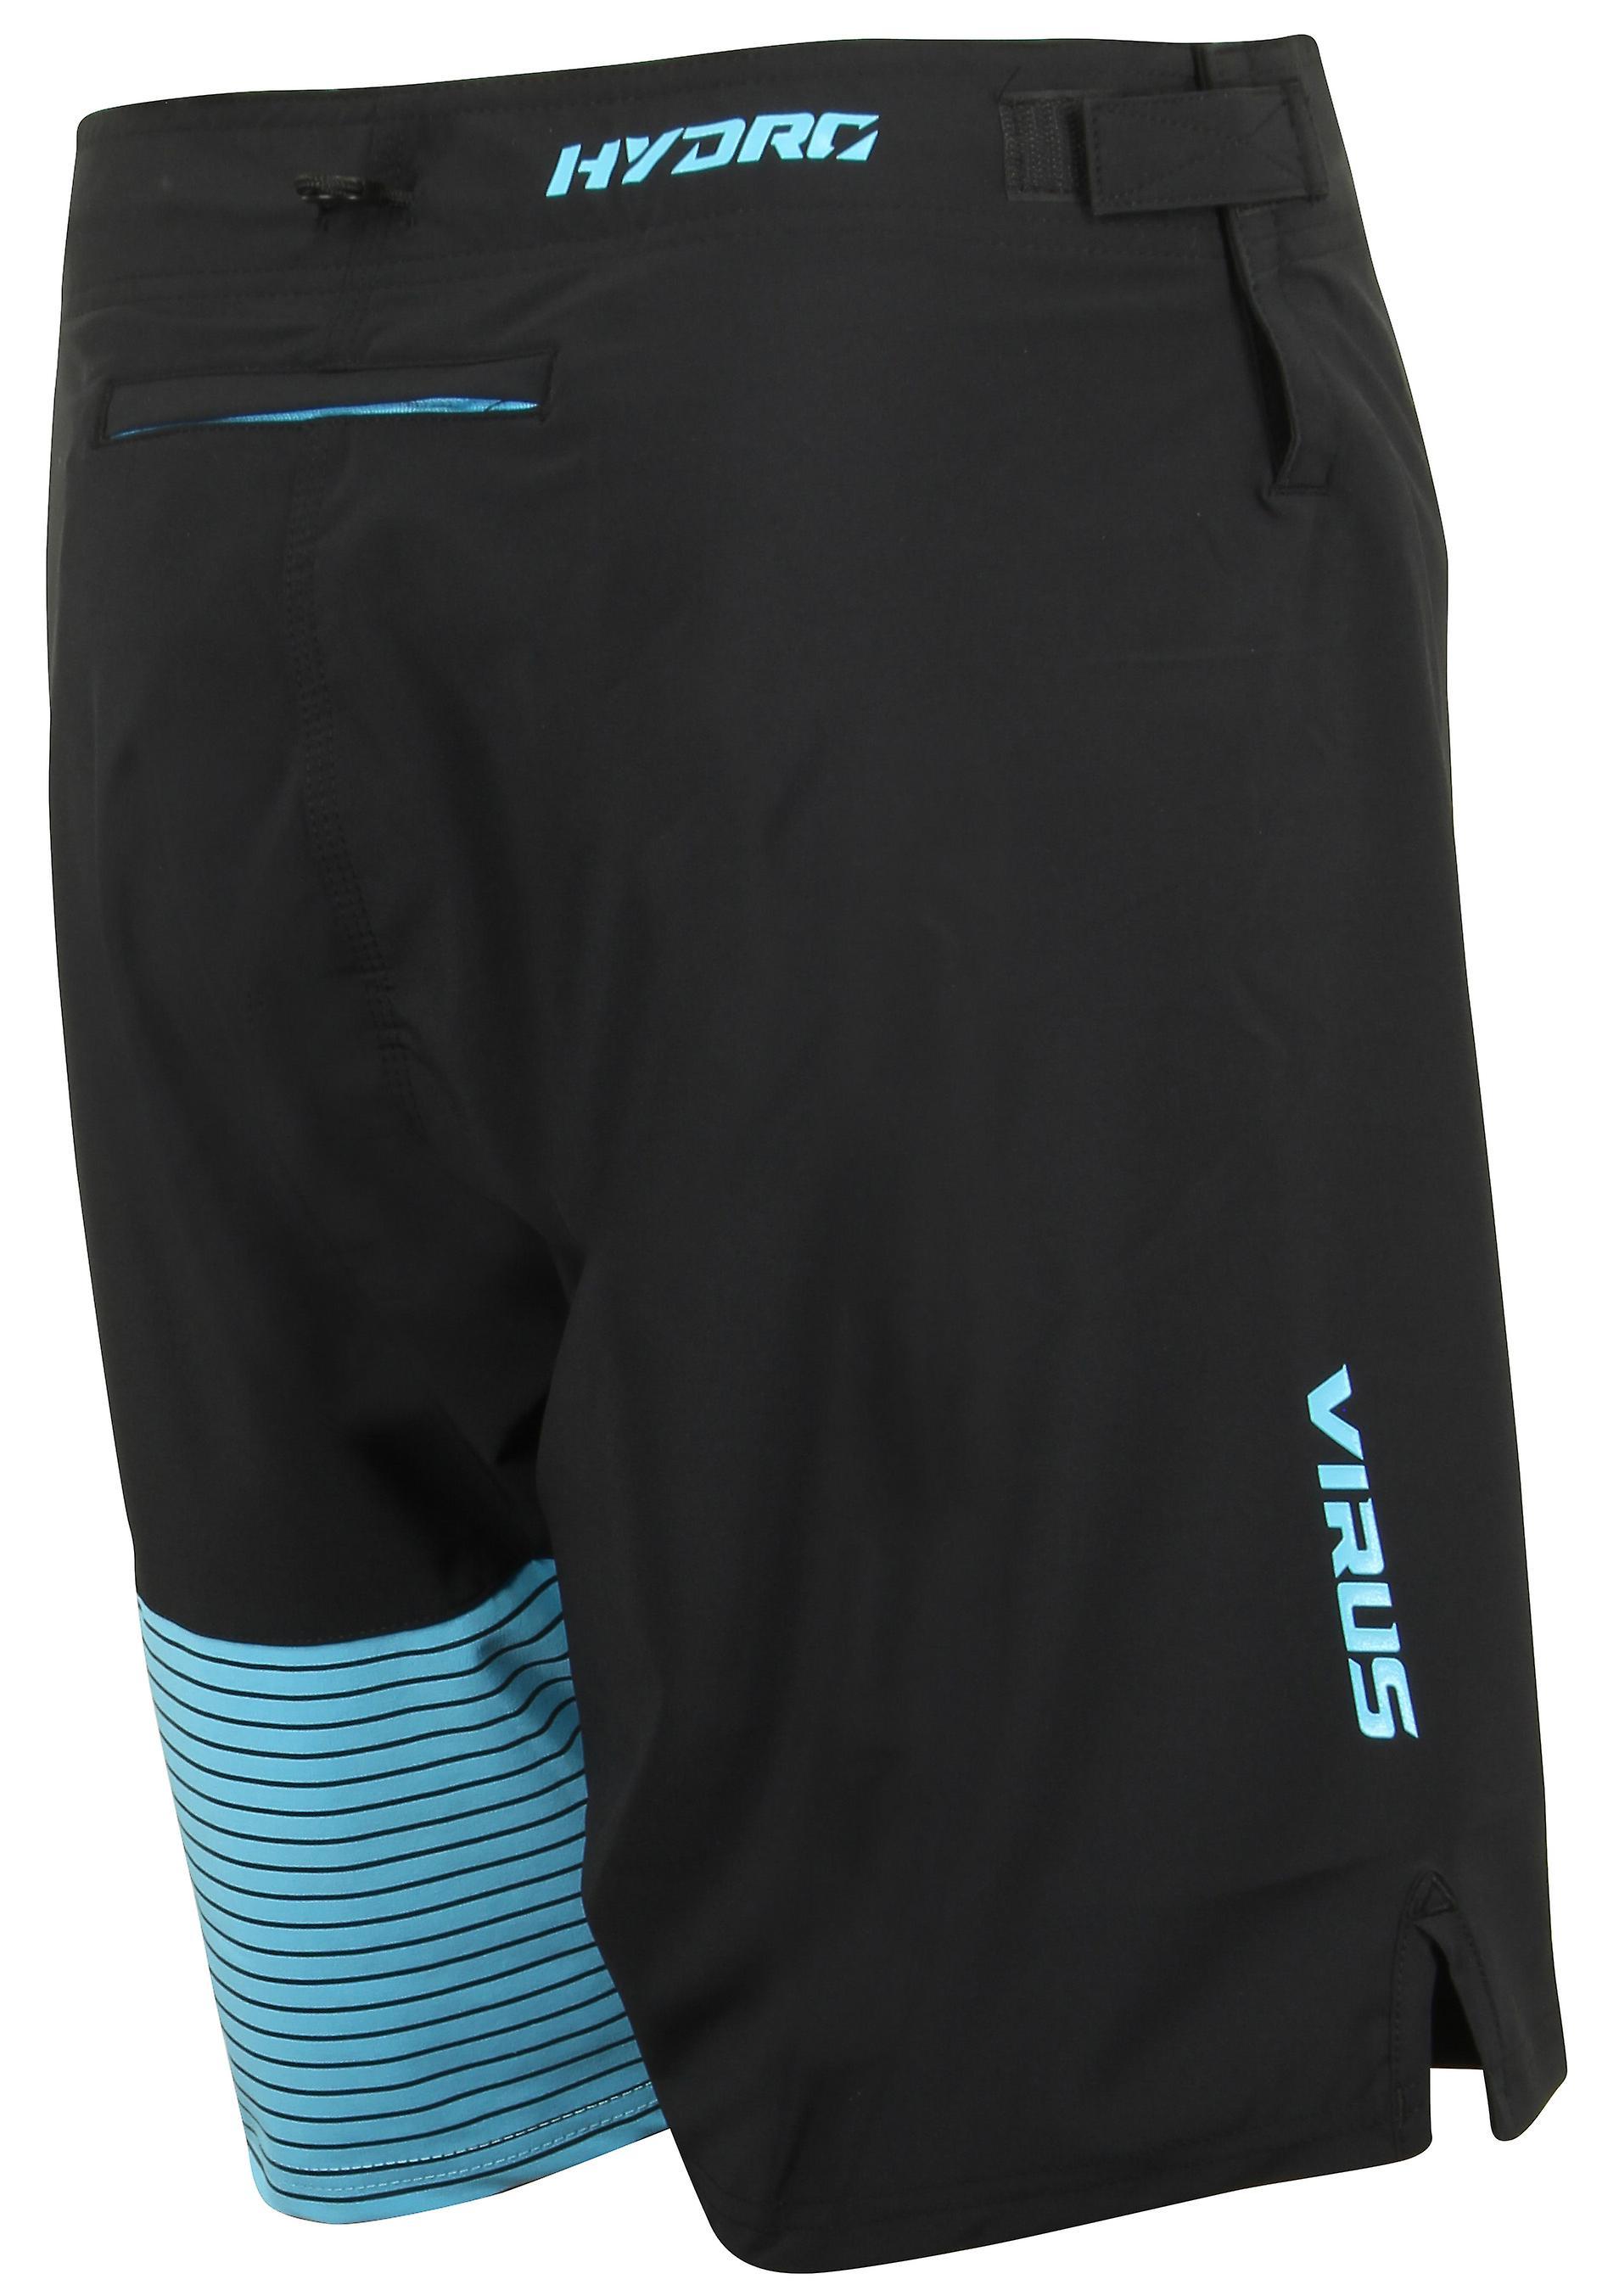 Virus Mens Hydro ST4 Performance Shorts - Black/Blue